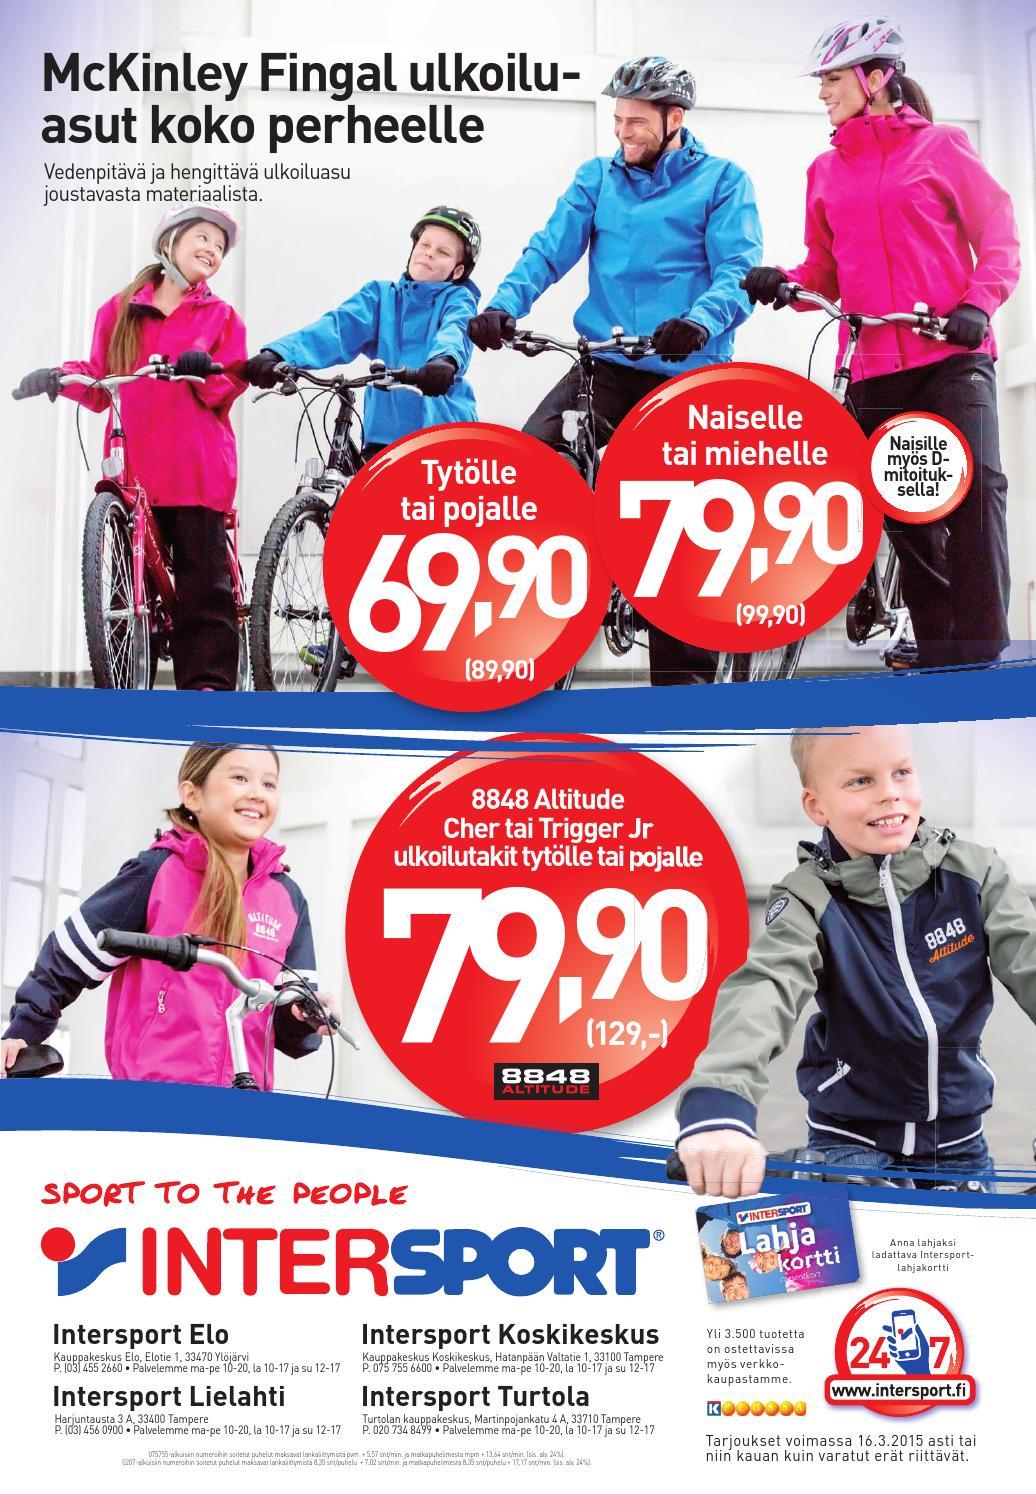 Intersport Turtola